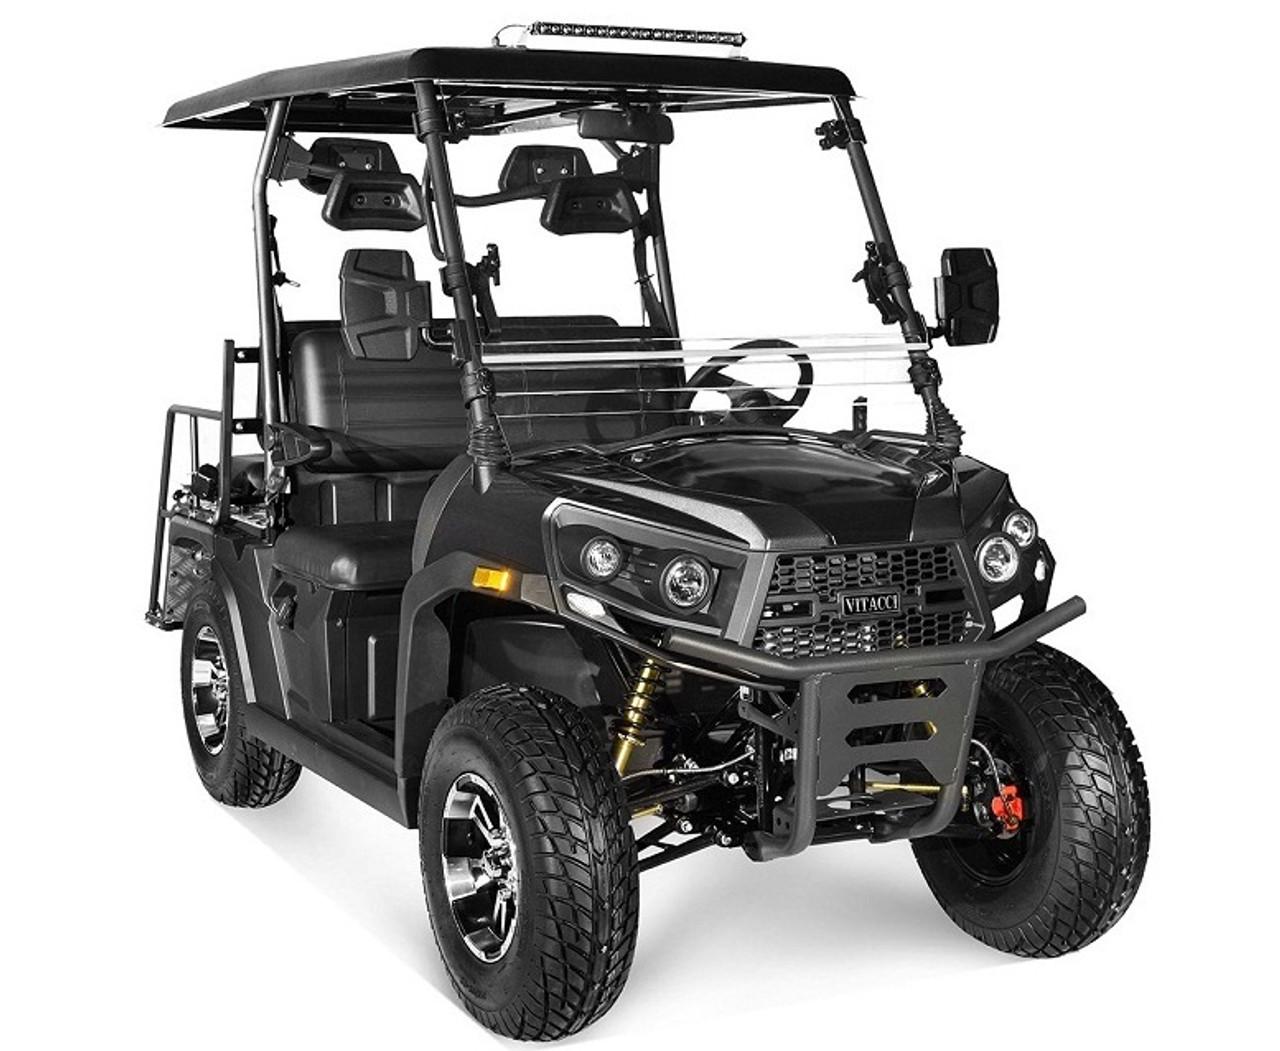 Grey - Vitacci Rover-200 EFI 169cc (Golf Cart) UTV, 4-stroke, Single-cylinder, Oil-cooled